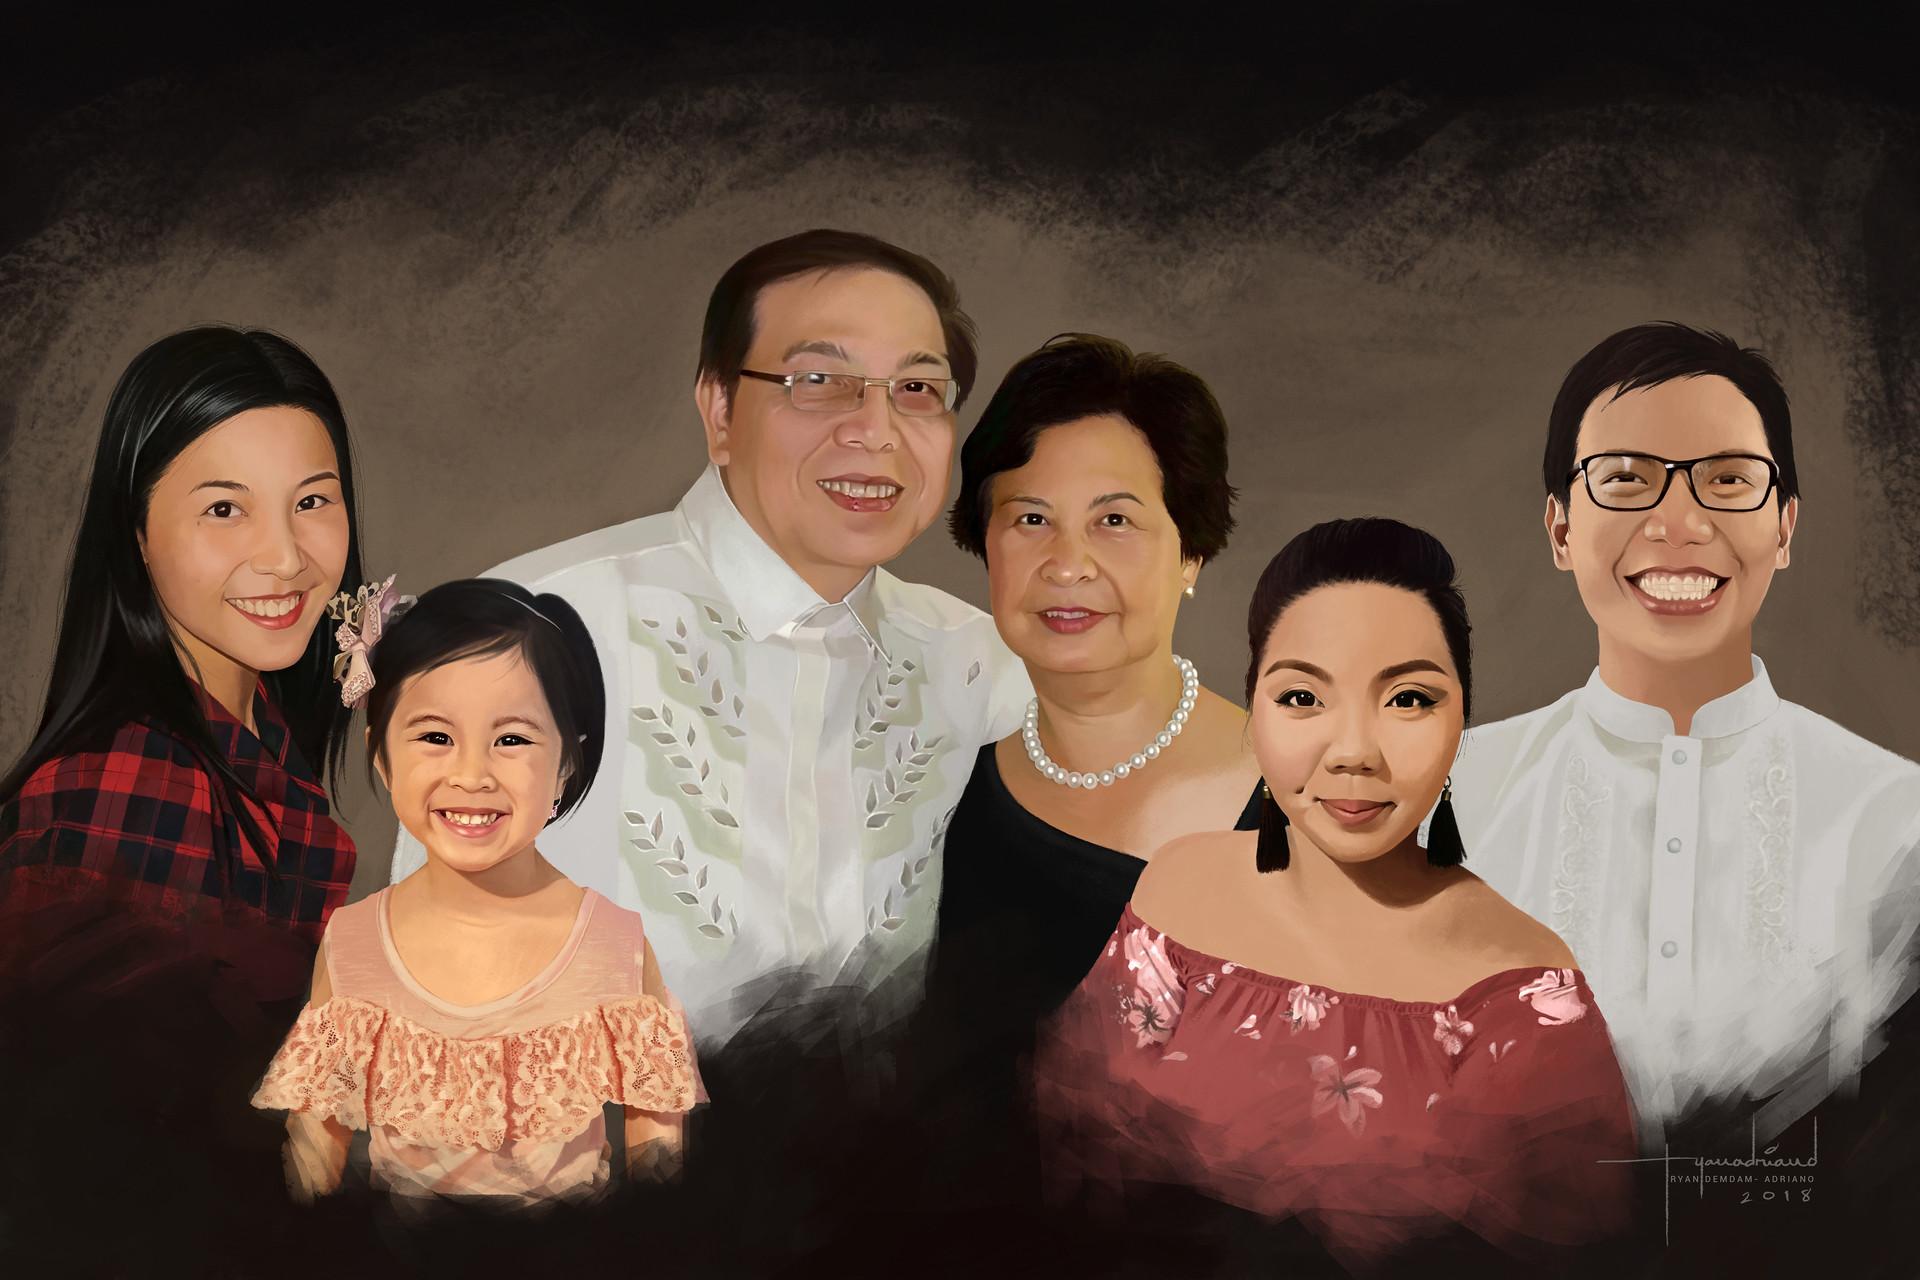 Rye adriano family portrait lower version